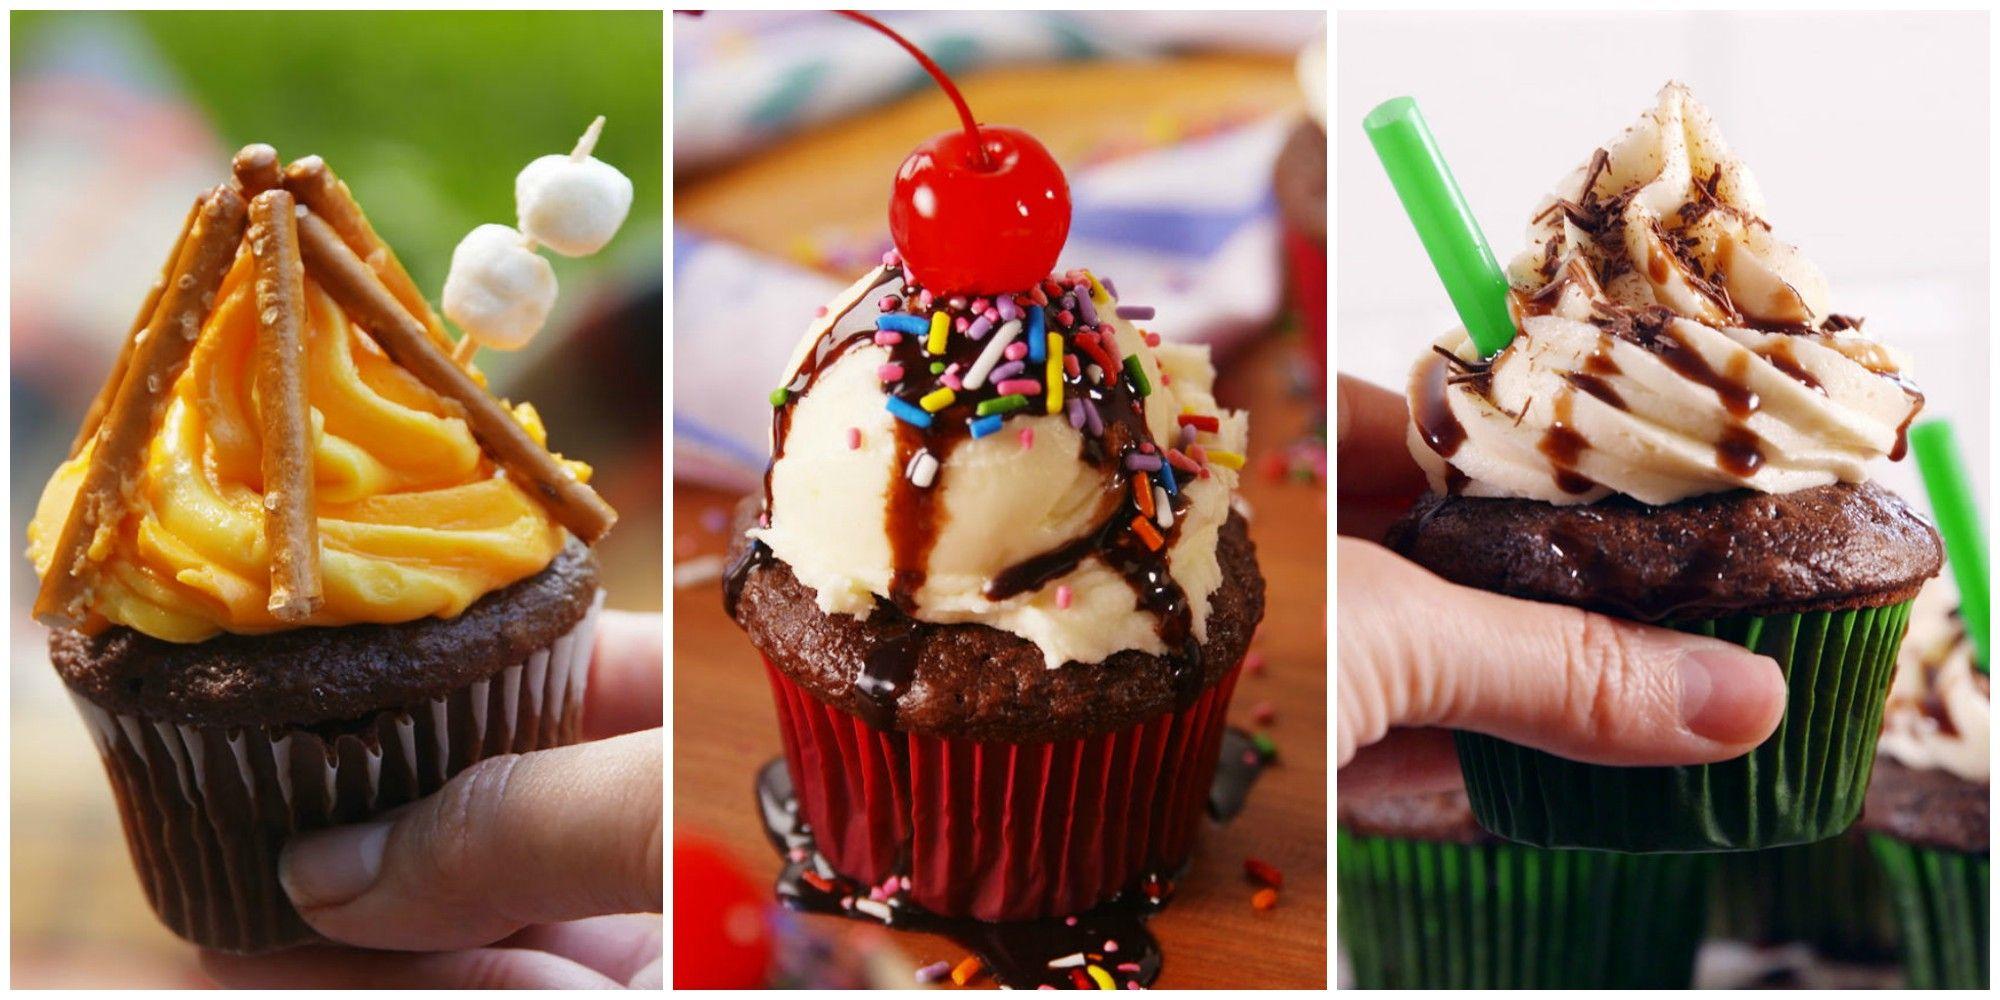 Mauidining: Cool Cupcake Designs Ideas